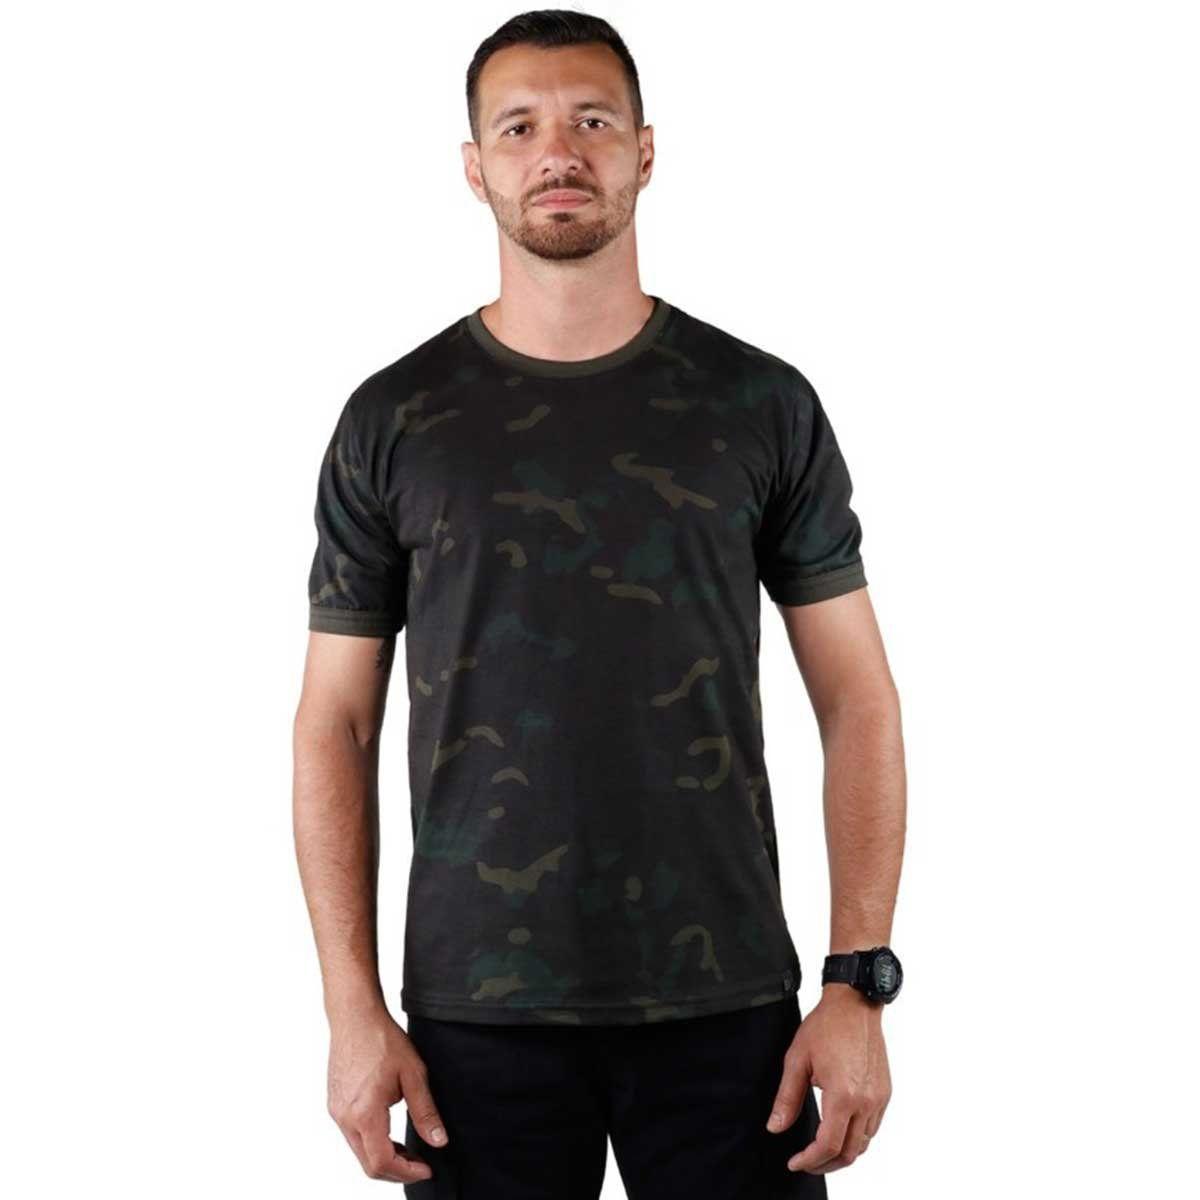 Camiseta Masculina Bélica Soldier Multicam Black